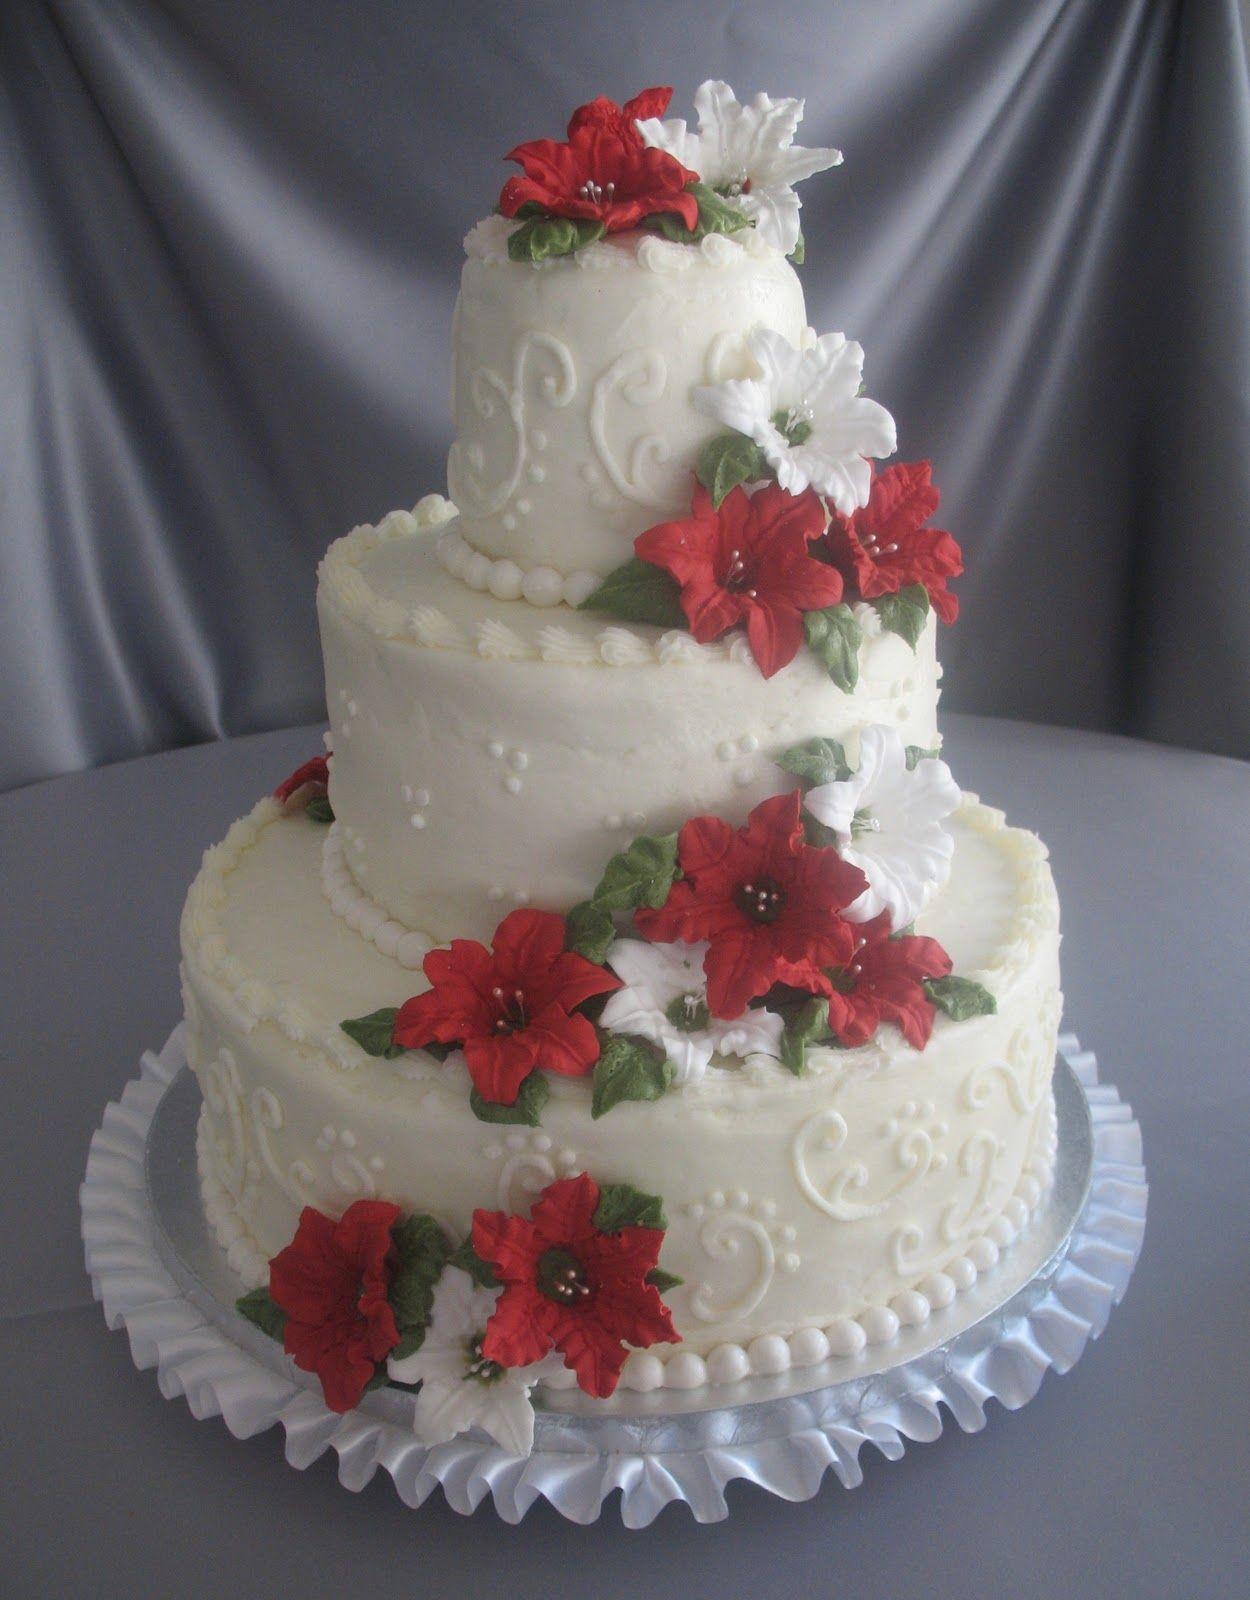 12 Ways to Pull off the Perfect Christmas Wedding ... |Christmas Wedding Cakes